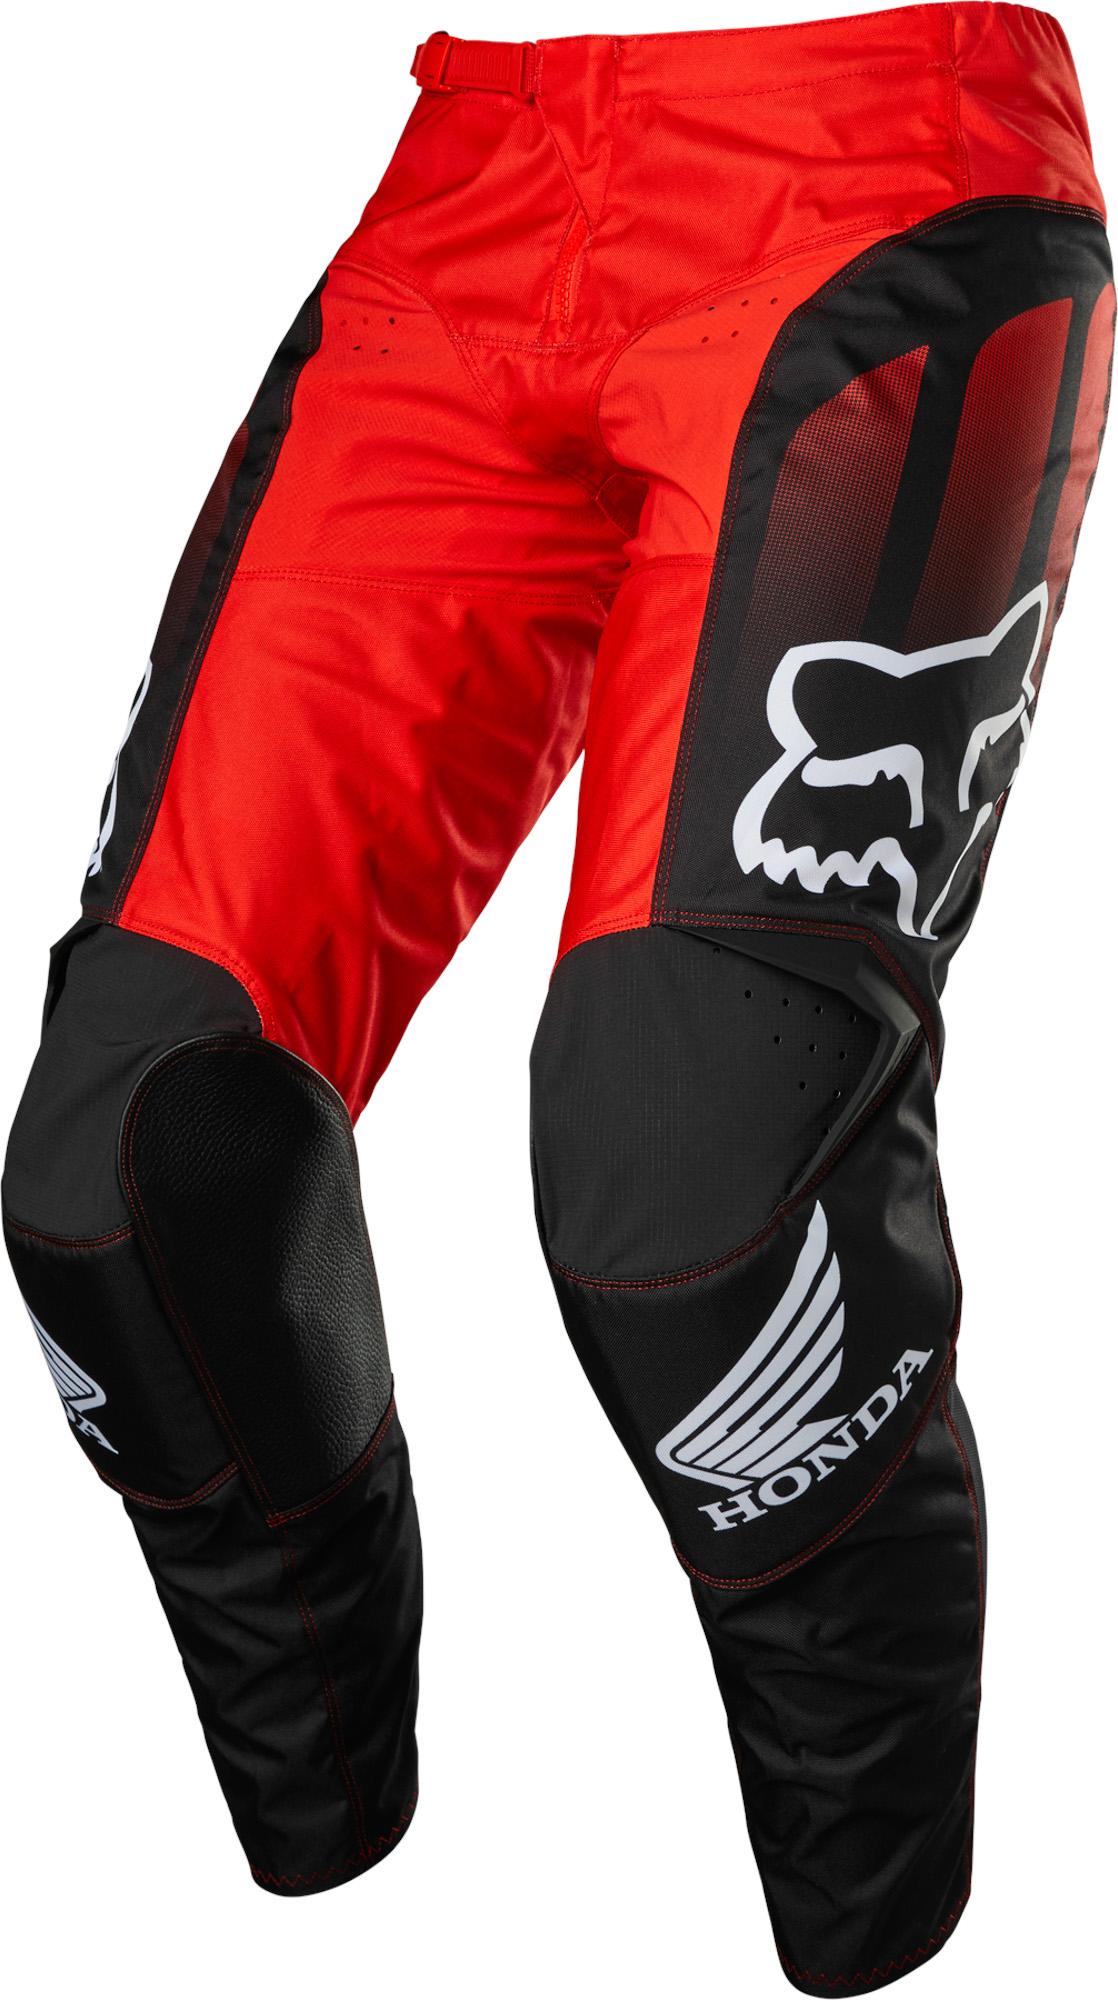 FOX 180 Honda Pant - BLACK/RED MX22